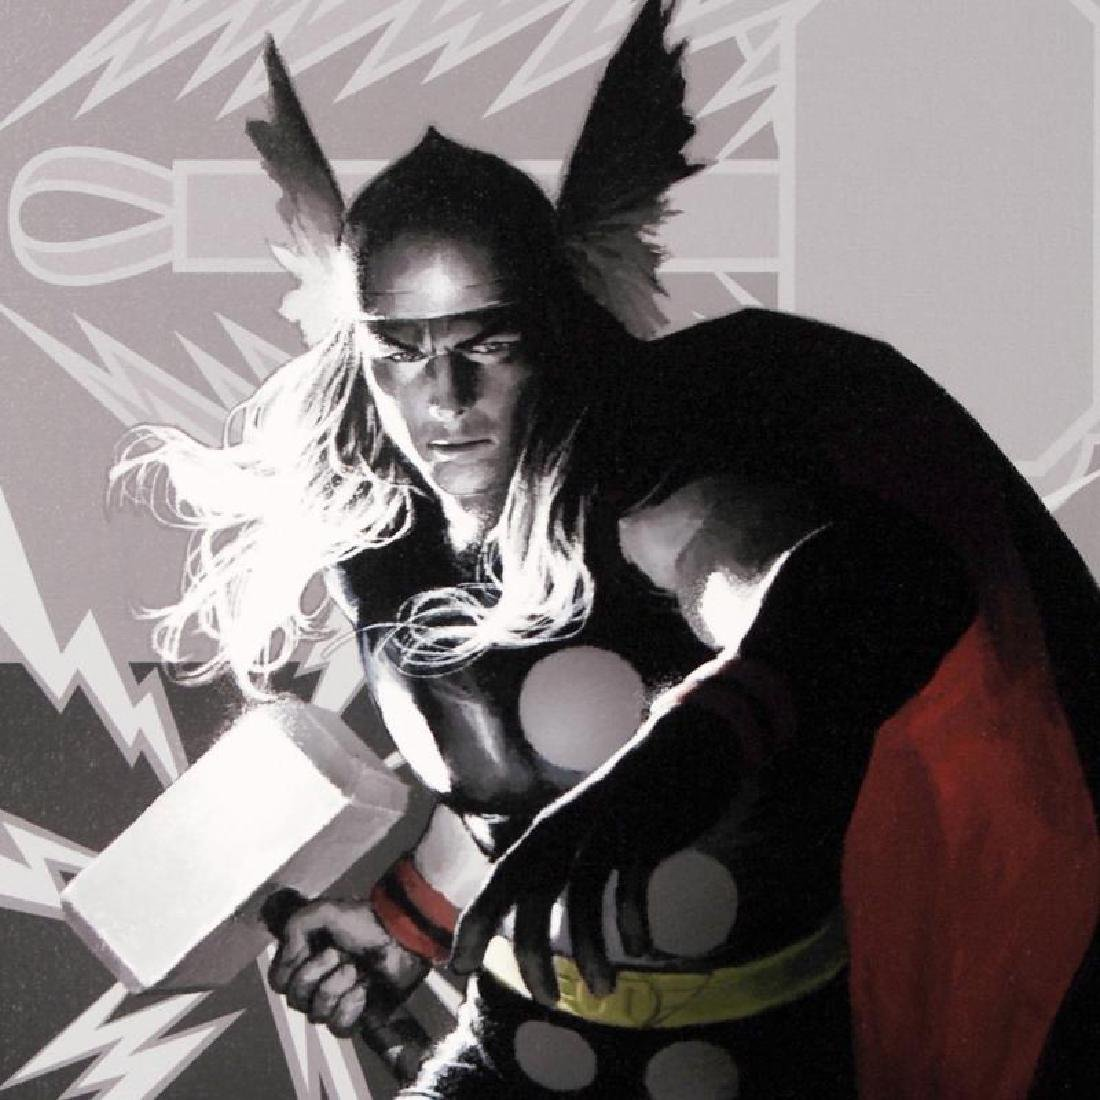 """Wolverine Avengers Origins: Thor #1 & The X-Men #2"" - 3"